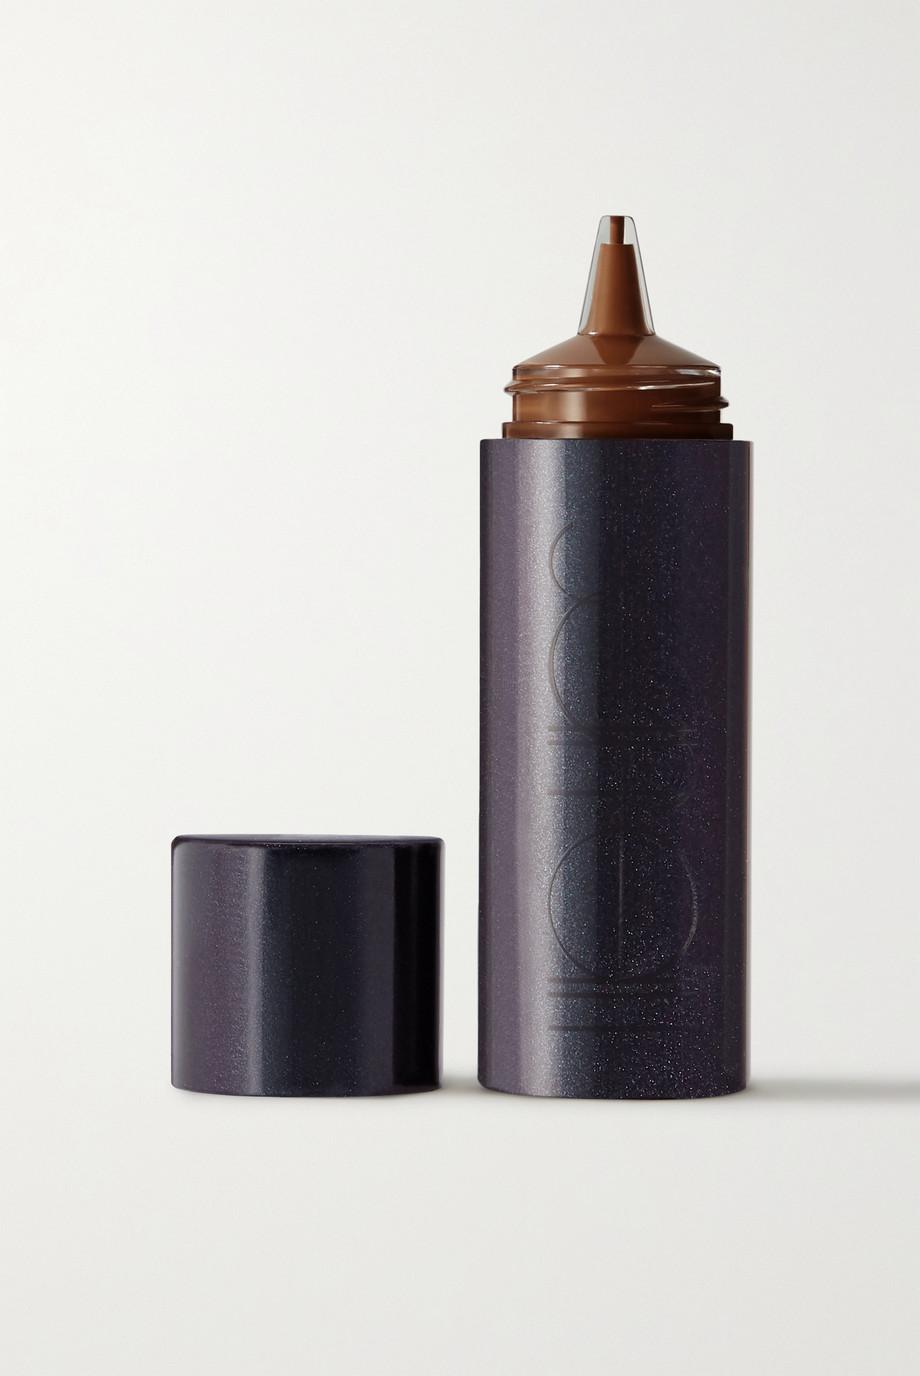 Surratt Beauty Dew Drop Foundation – 18, 19 ml – Foundation